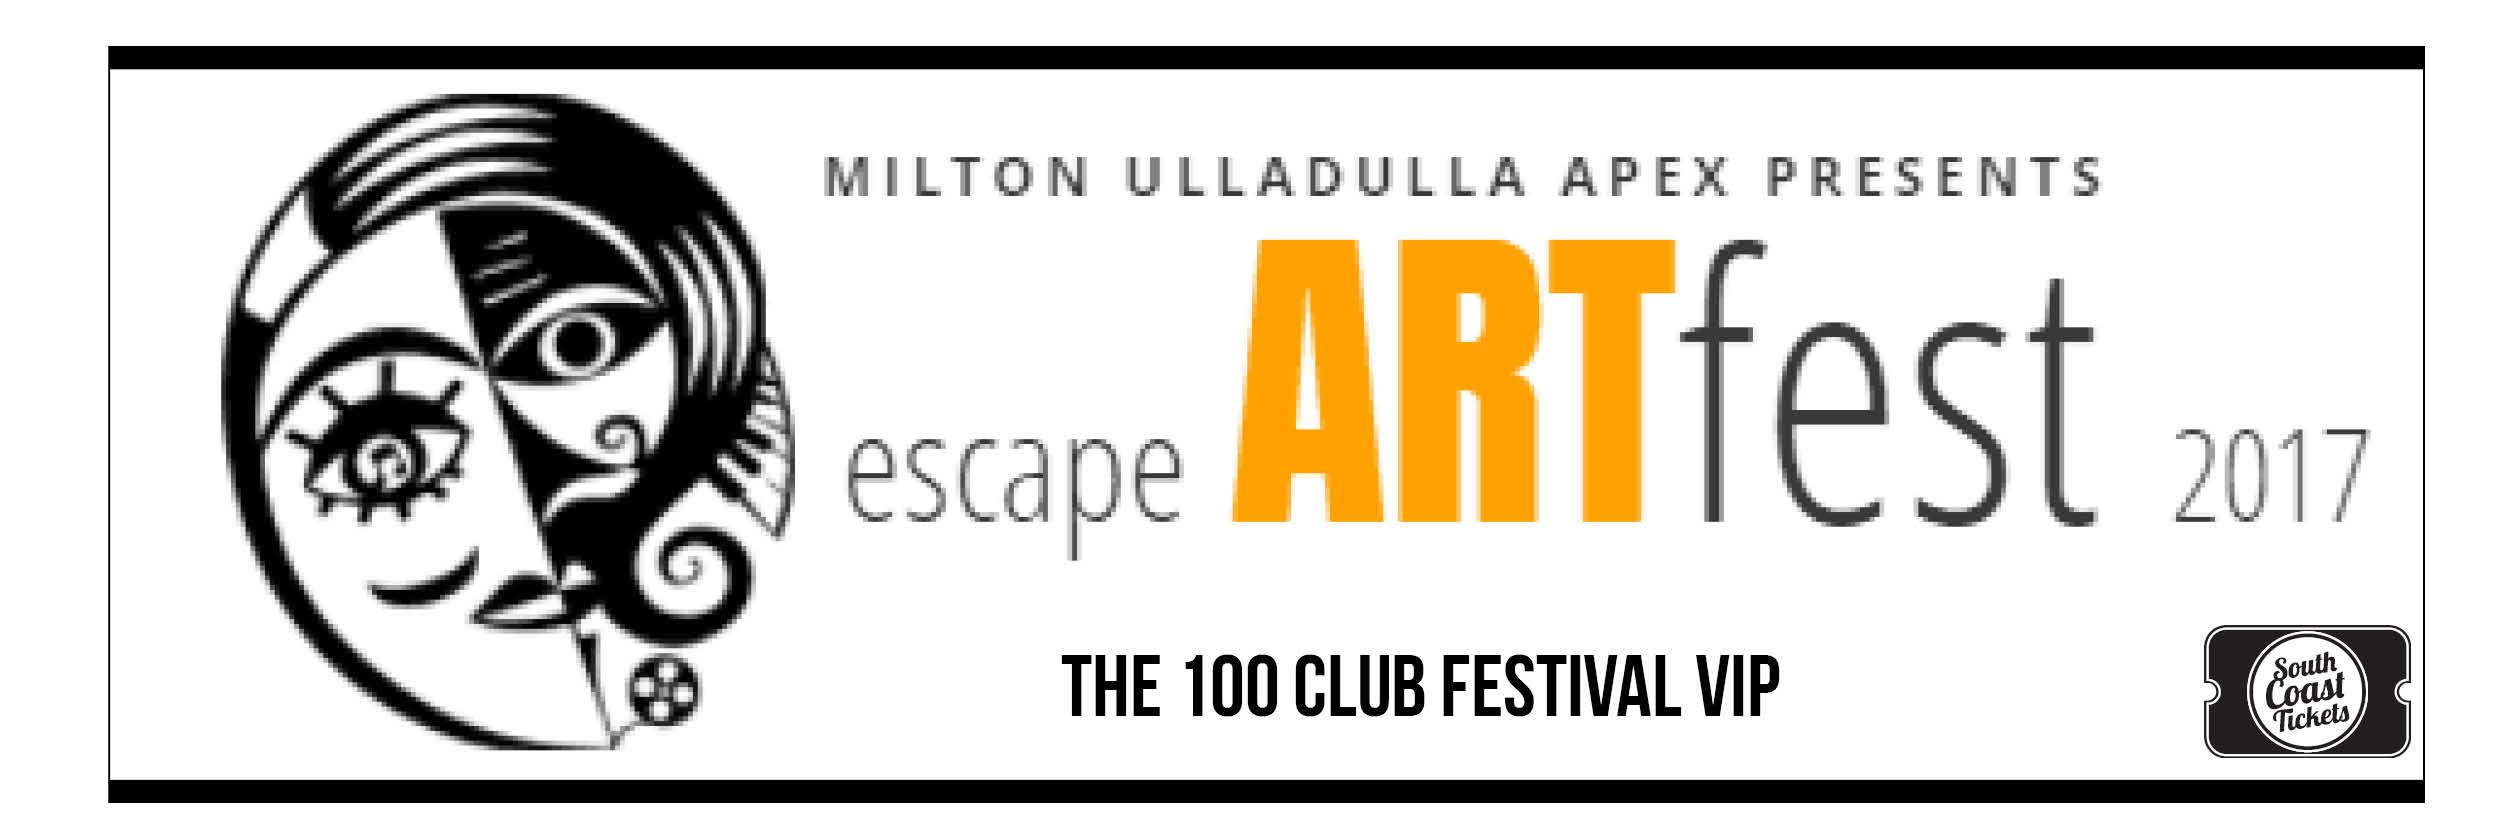 The 100 Club Festival VIP